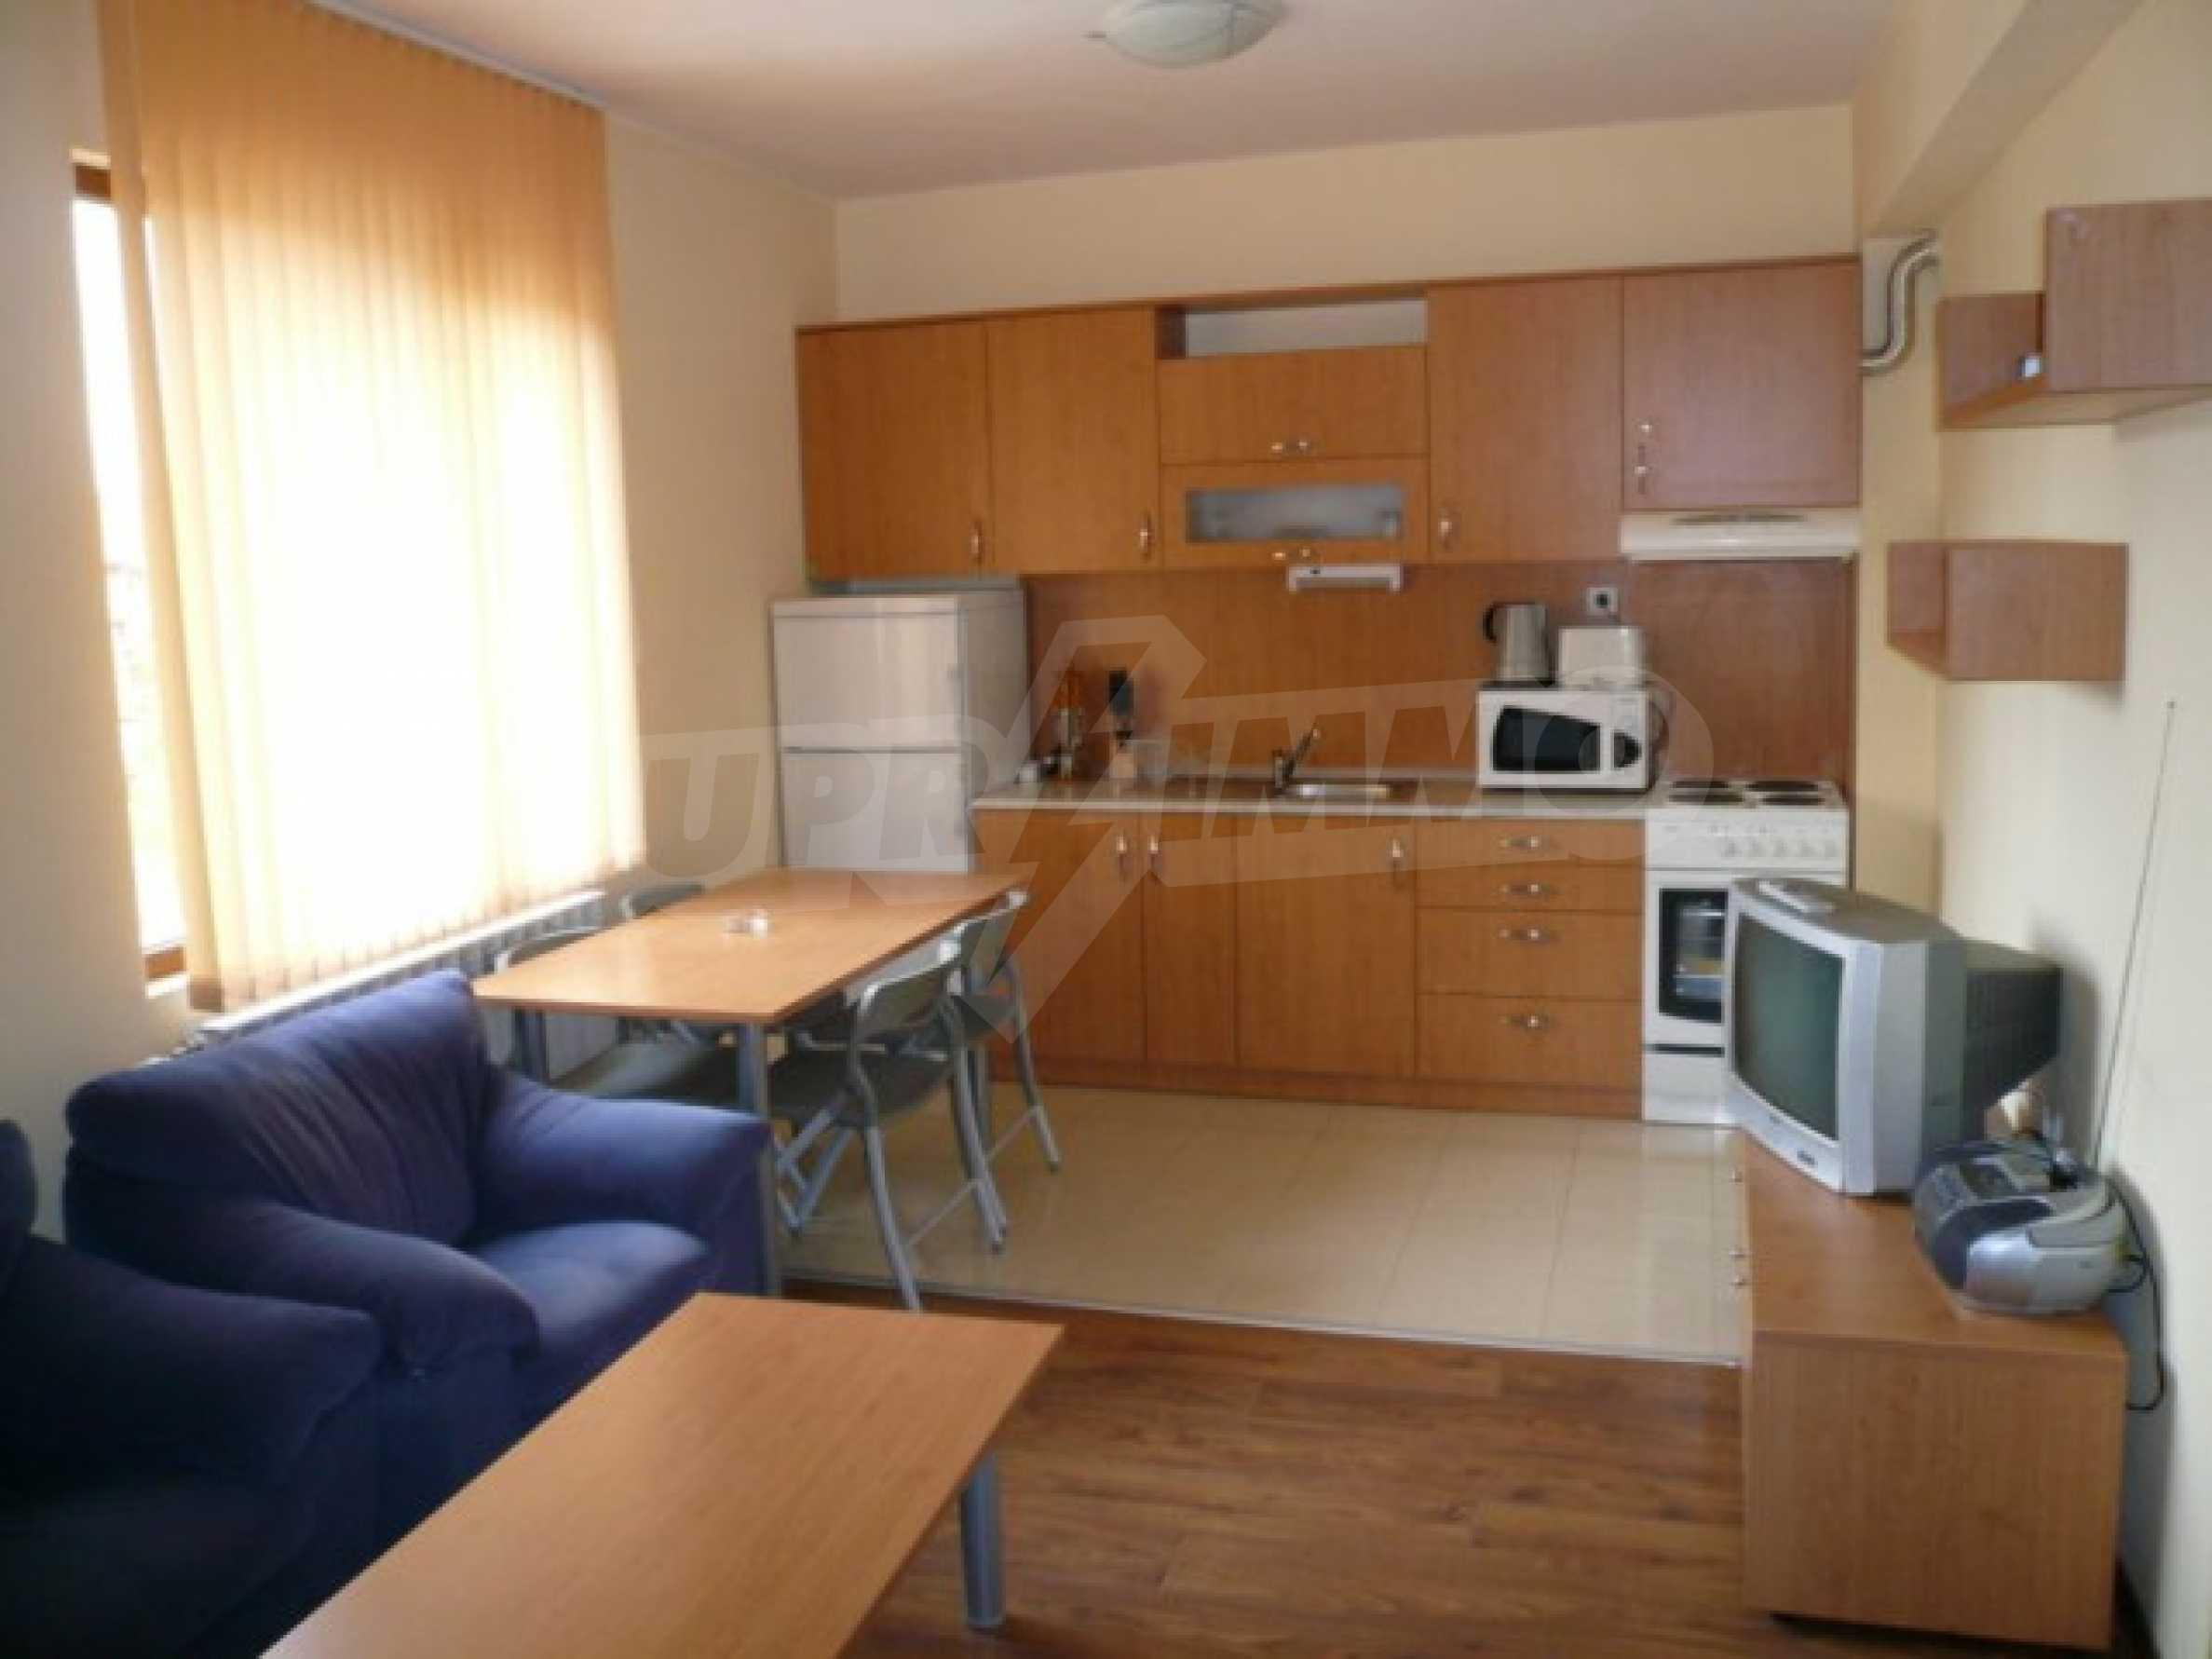 Двустаен апартамент за продажба в гр. Банско 2